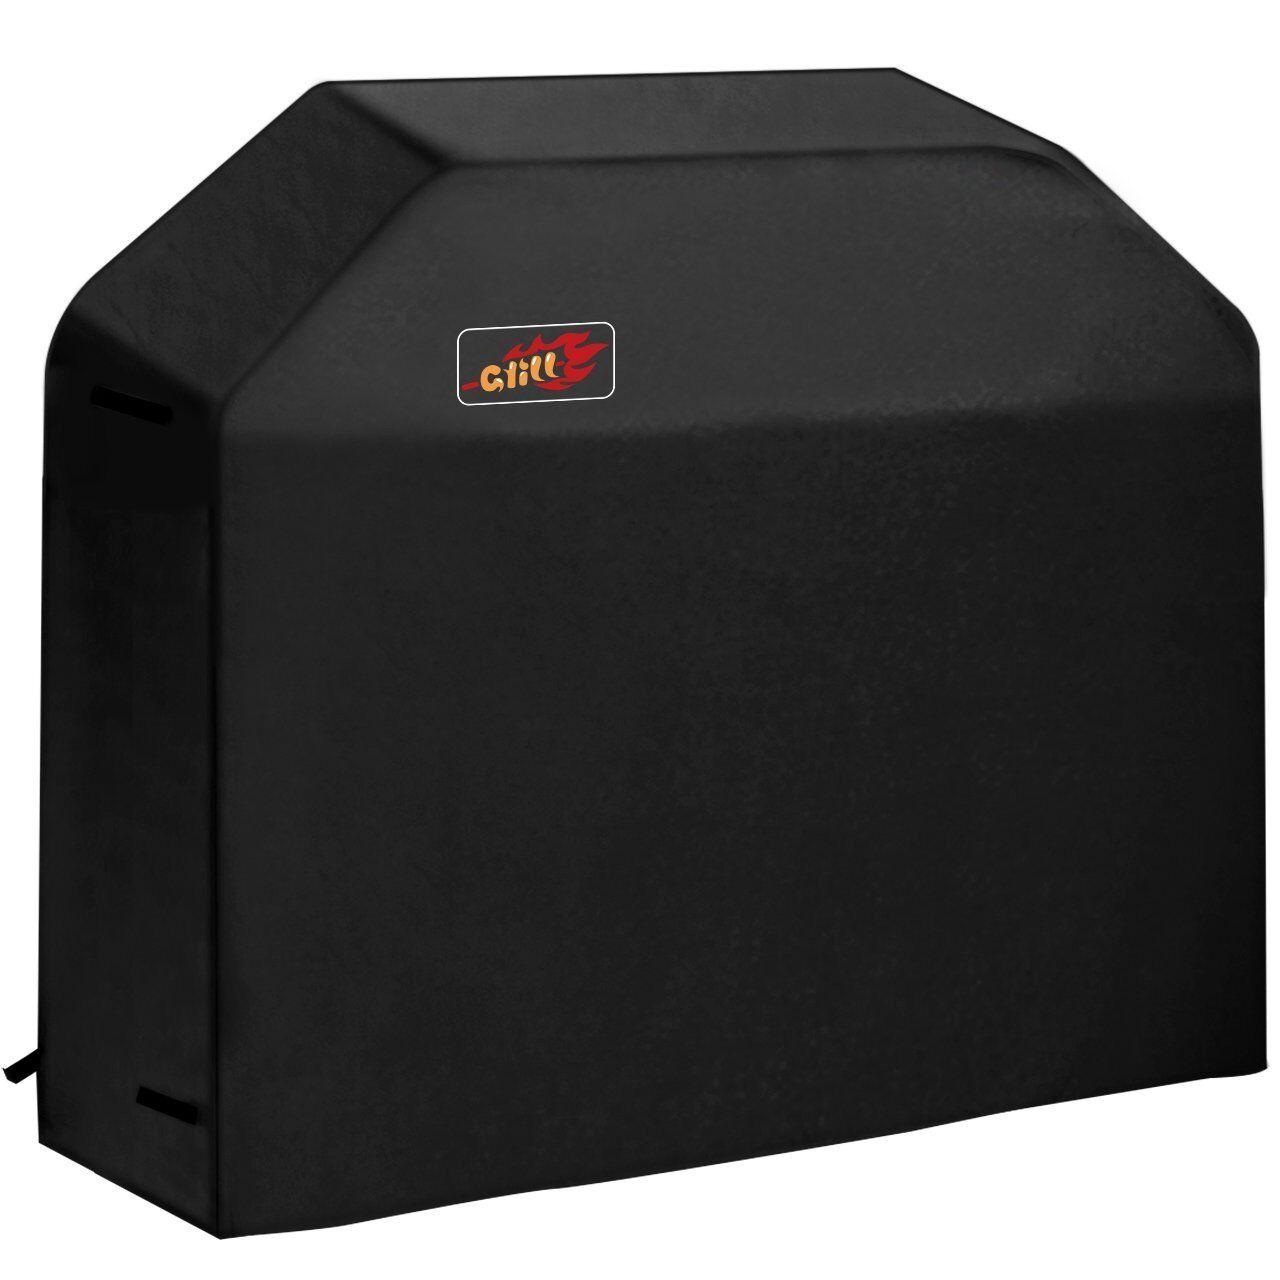 "VicTsing 3-4 Burner BBQ Gas Grill Cover 58"" 600D Waterproof"